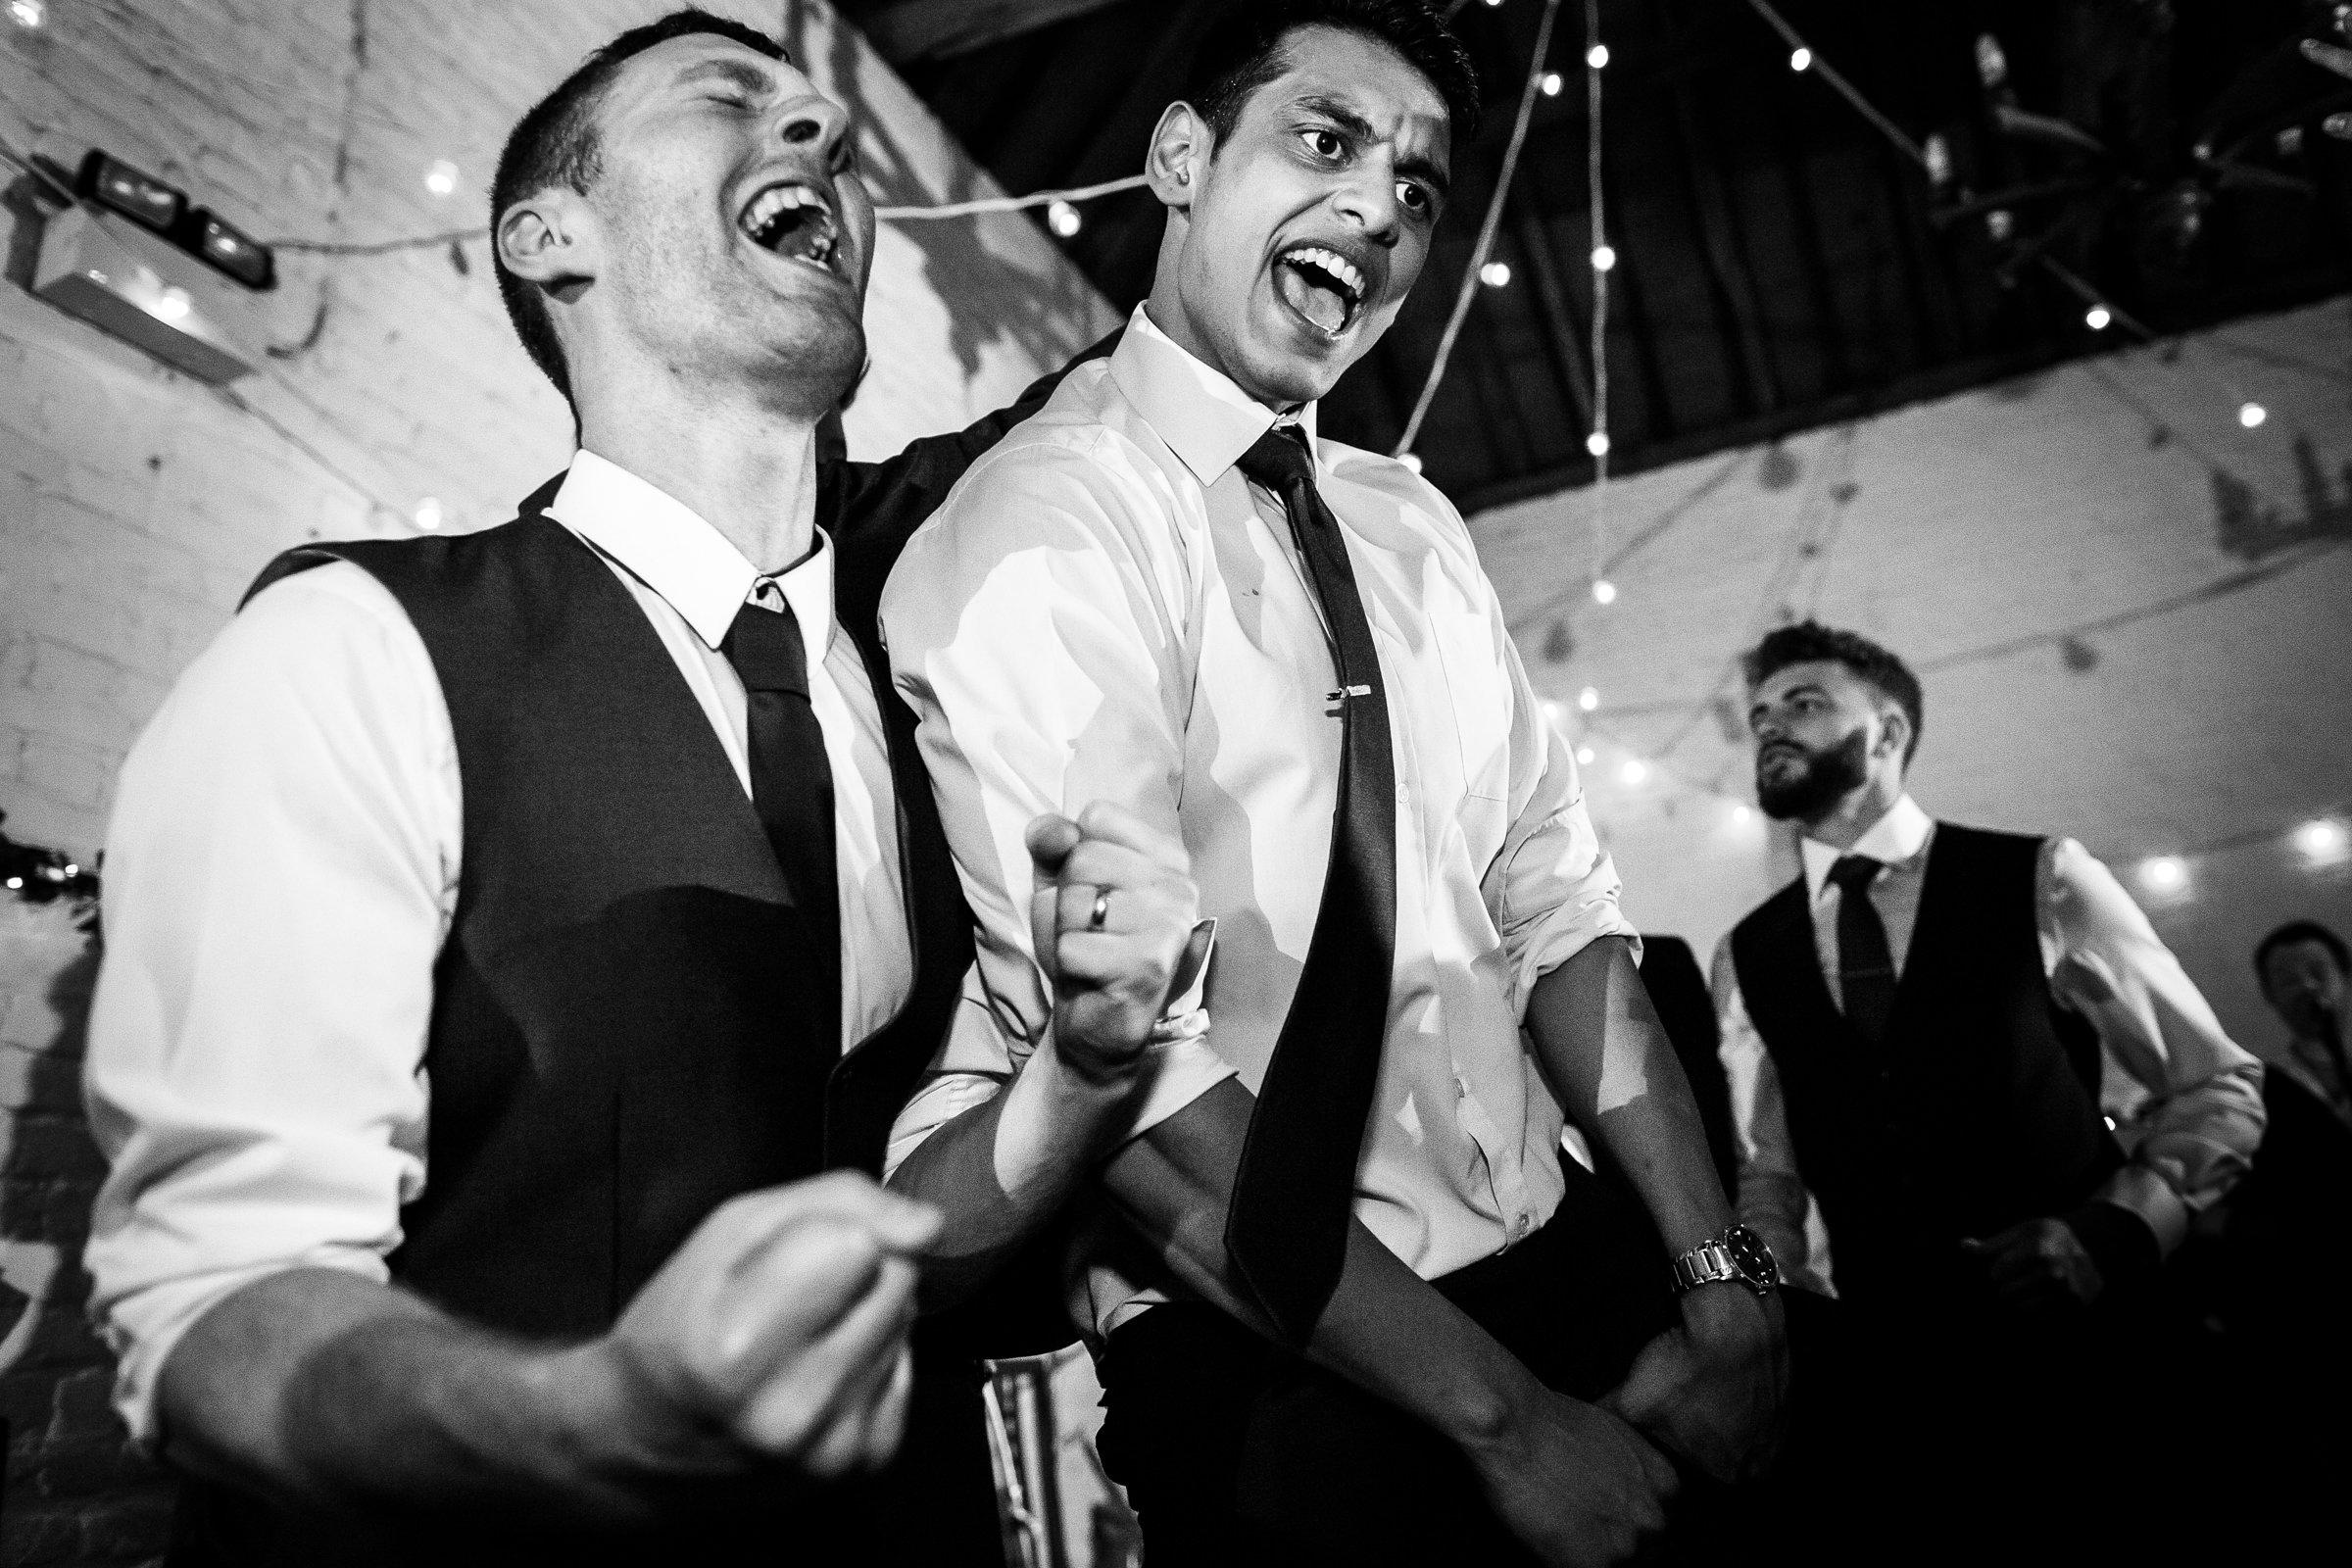 Fun dancing wedding photo